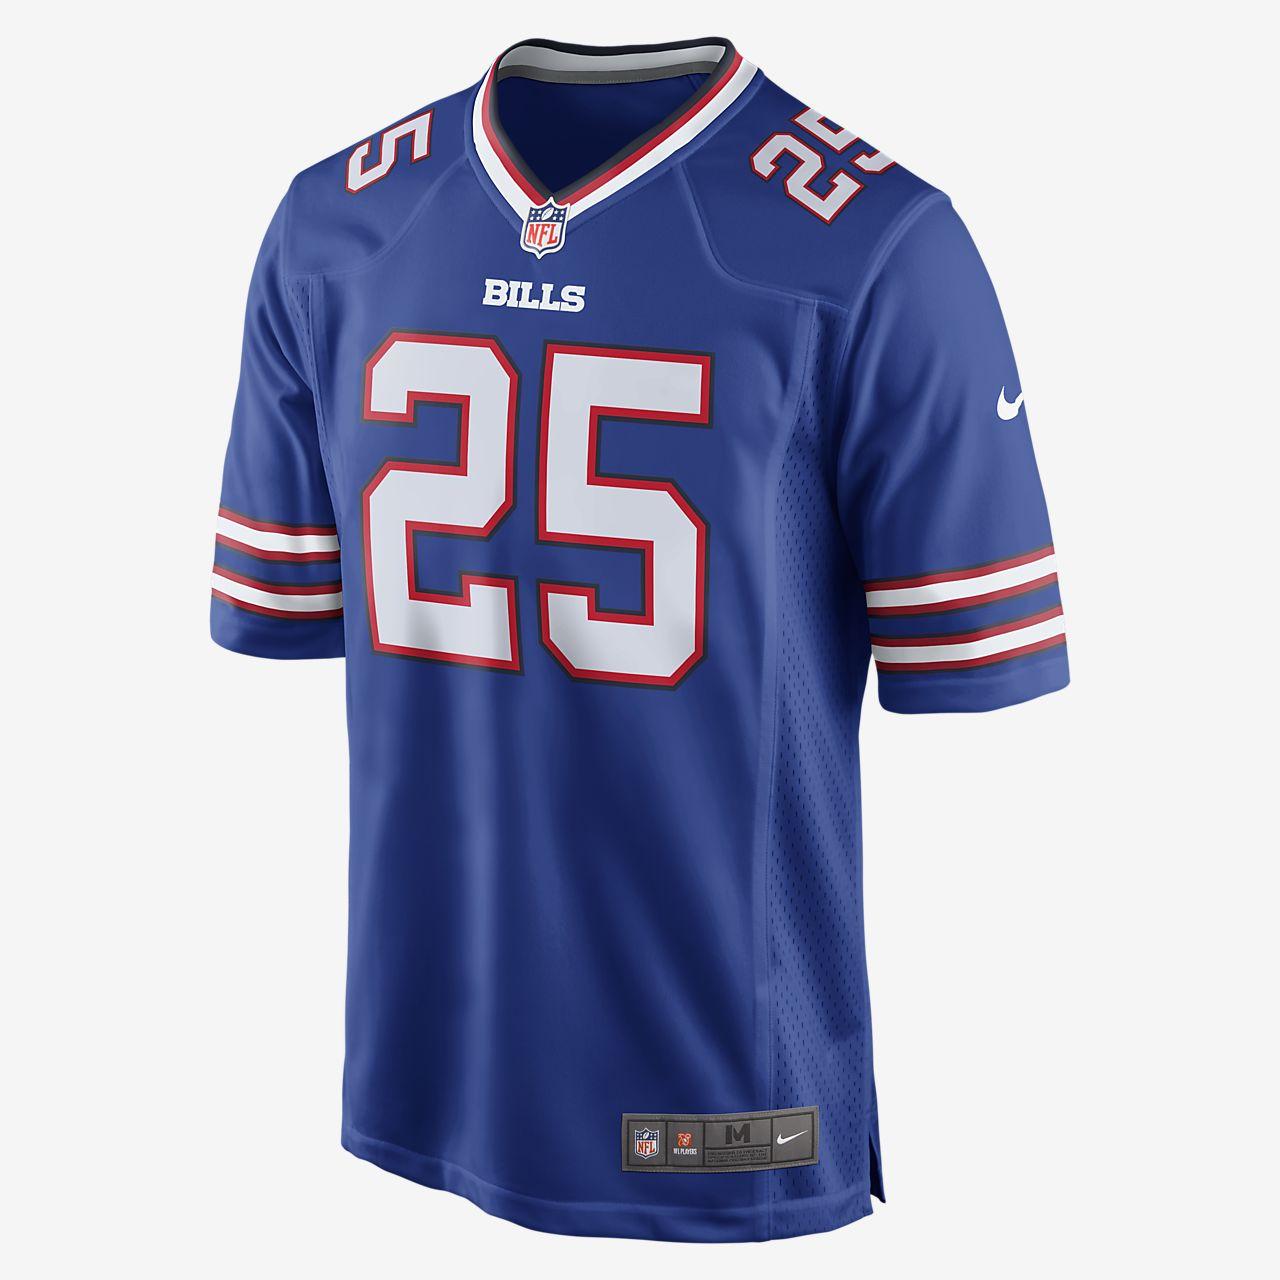 Camiseta oficial de fútbol americano para hombre NFL Buffalo Bills (LeSean  McCoy) 316b1a01054